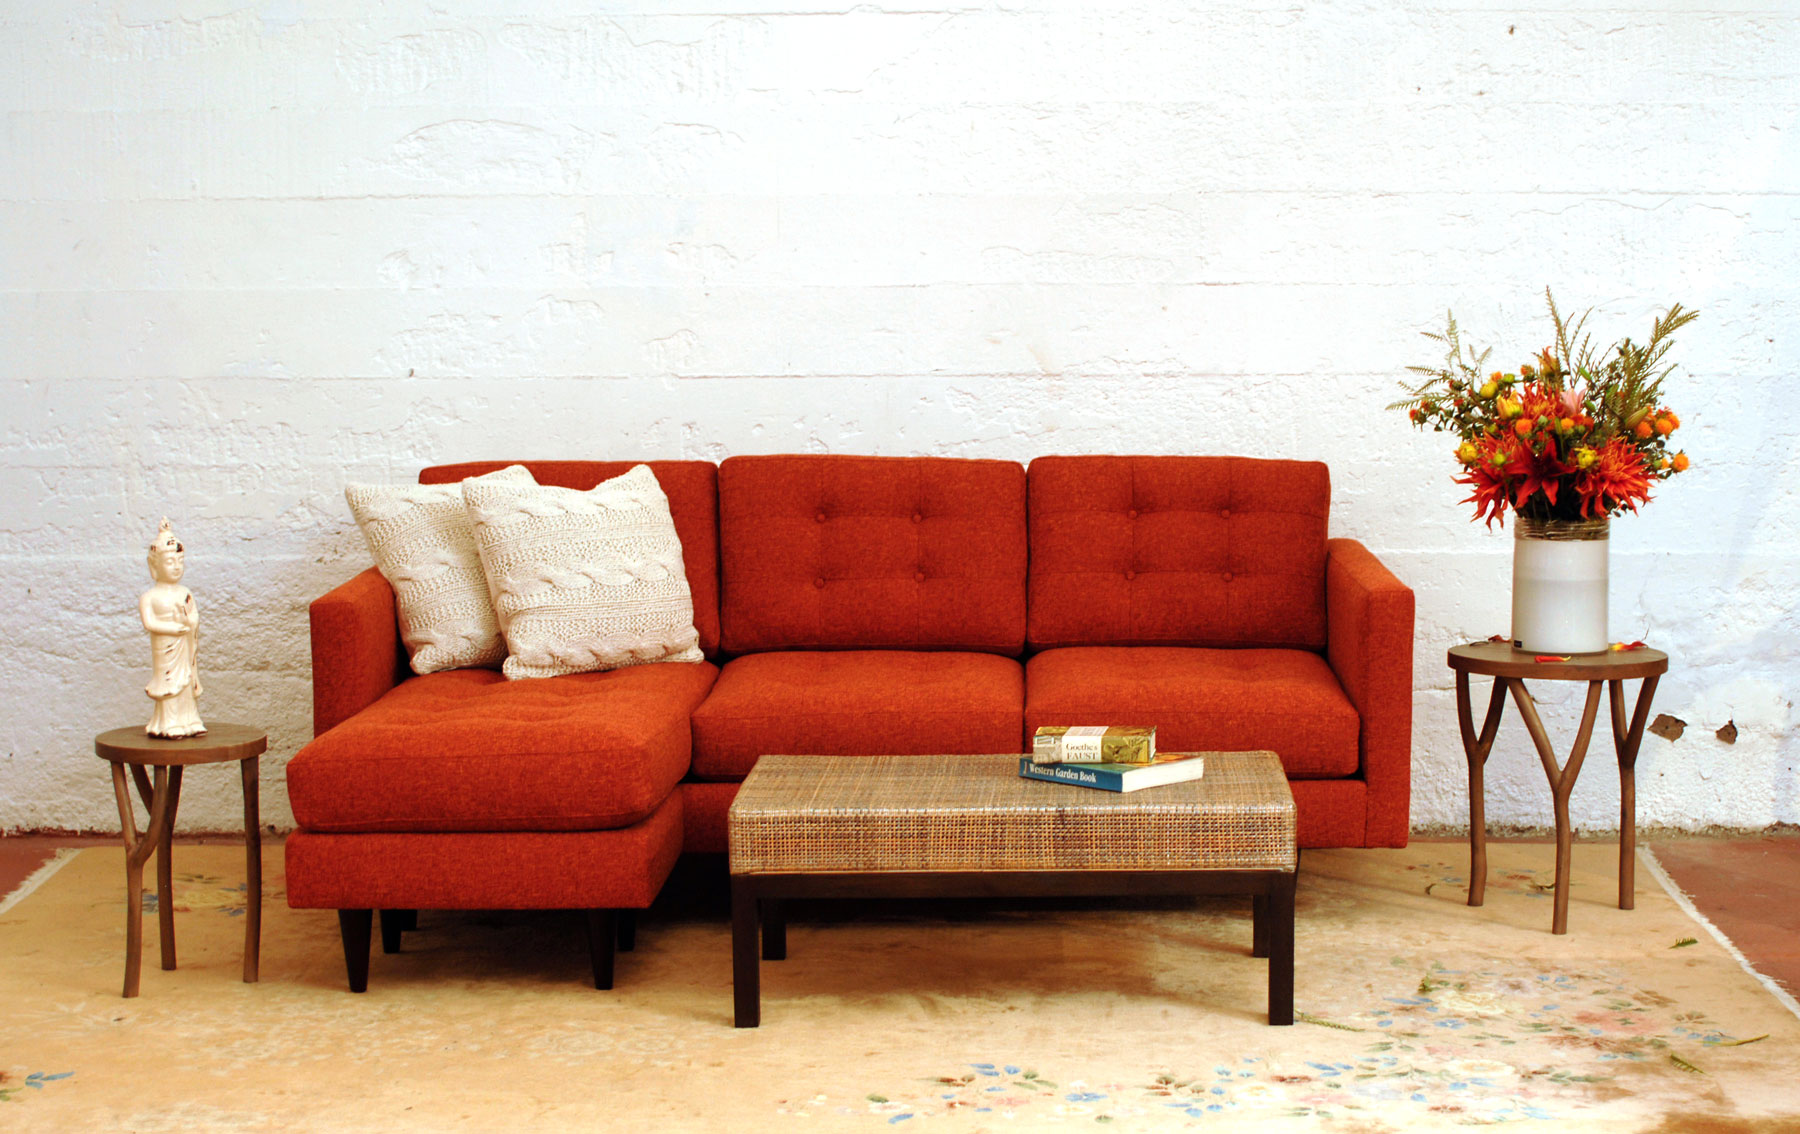 urban sofa gallery alton track arm mattress albany ny cheap furniture stores hero image liquidation www elderbranch com